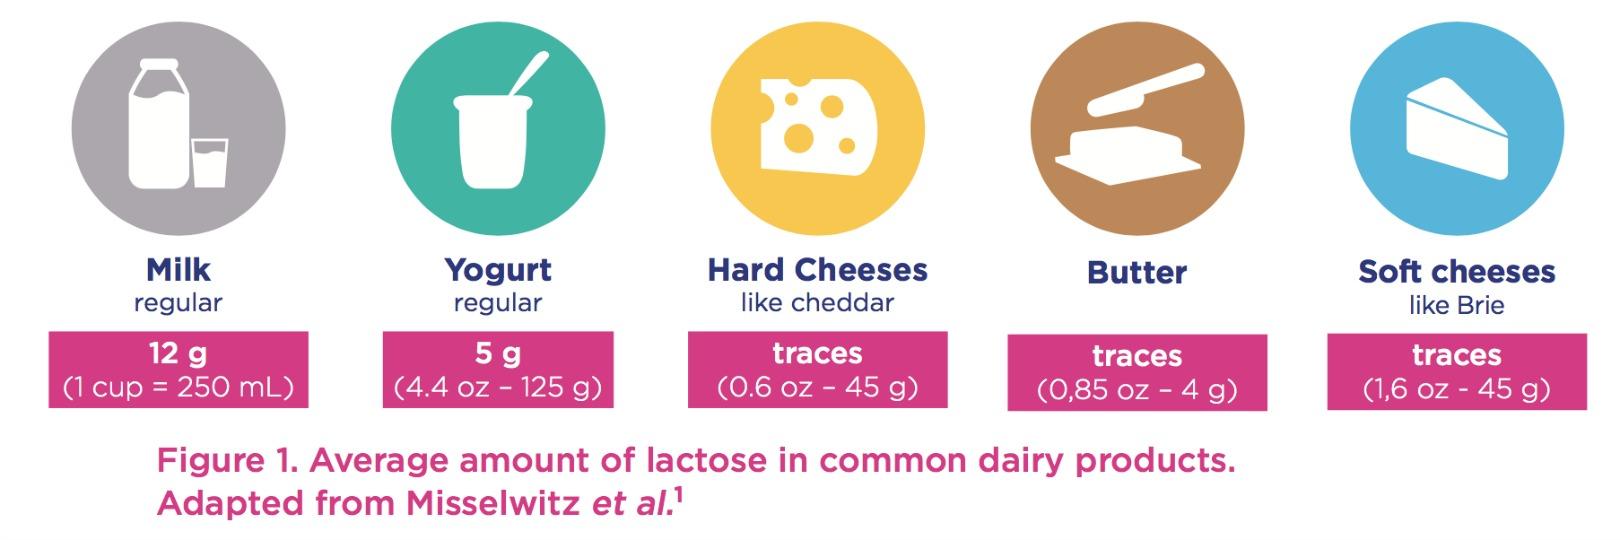 lactose-wgo-dairy-yogurt